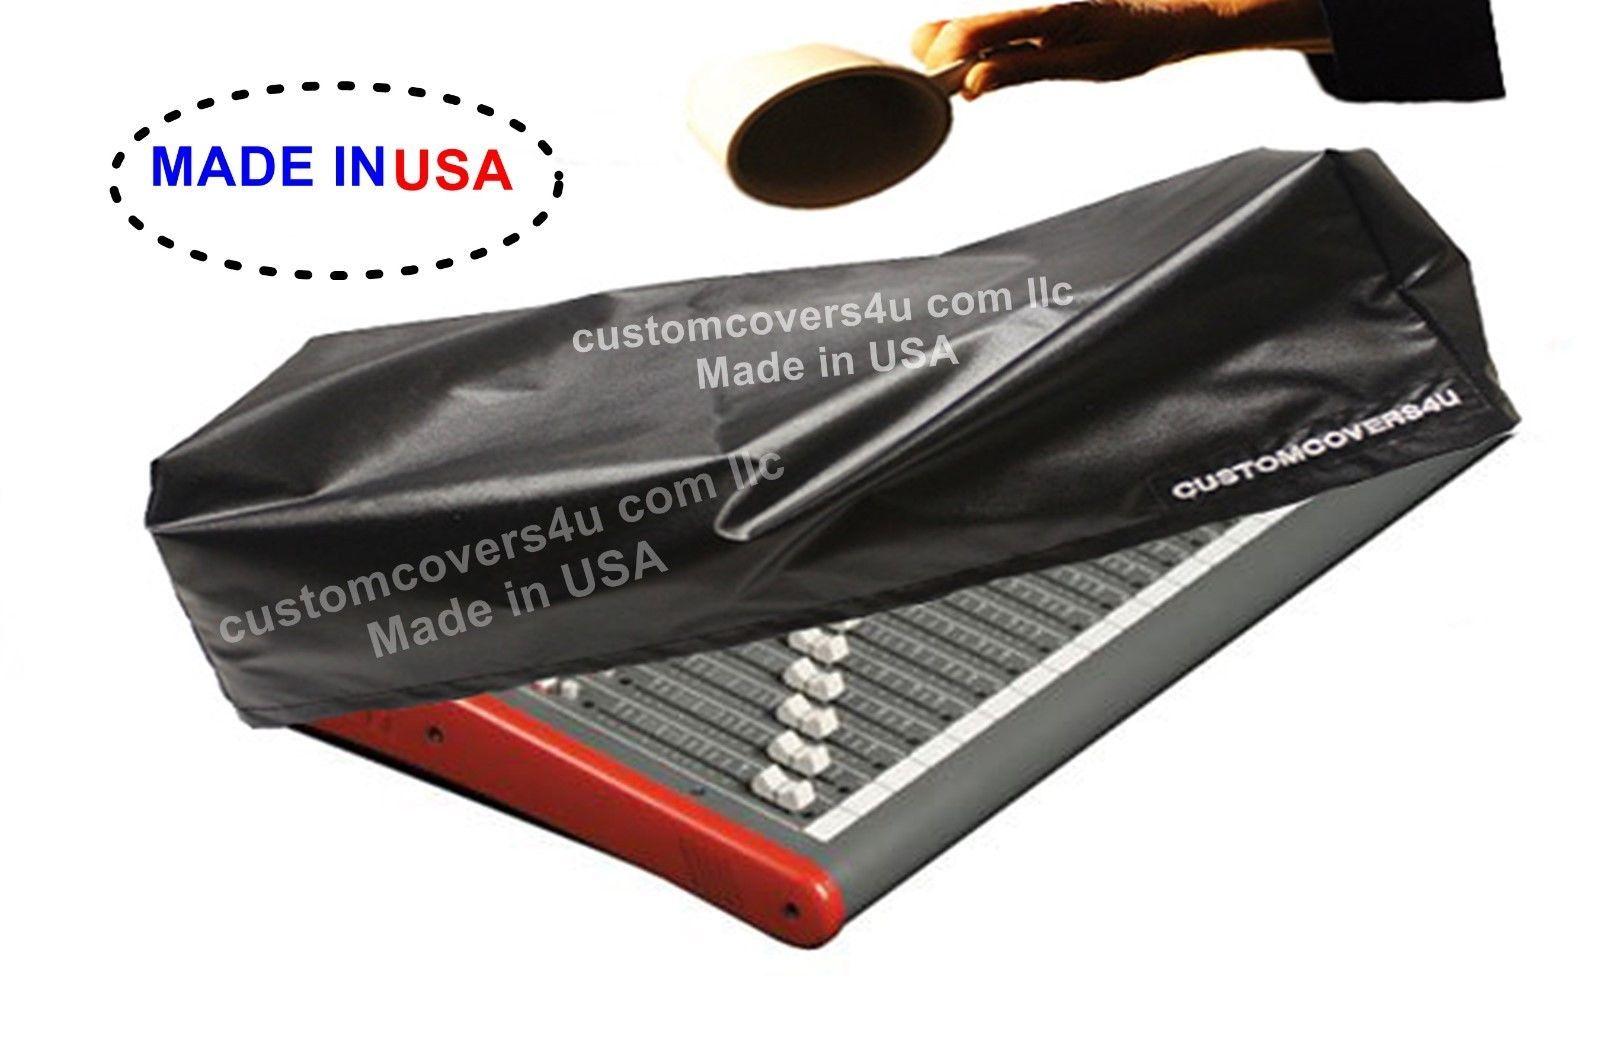 Mackie Profx8v2 Mixer Dust Cover Home Studio And 50 Similar Items Profx8 V2 S L1600